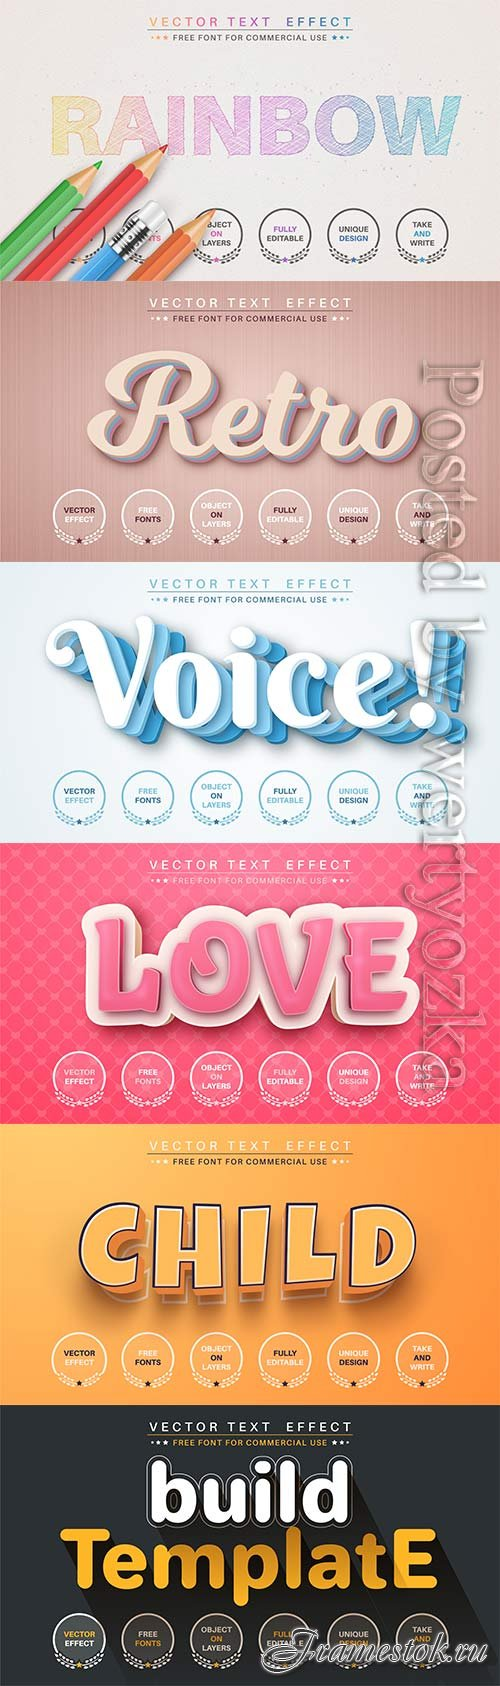 3d editable text style effect vector vol 752